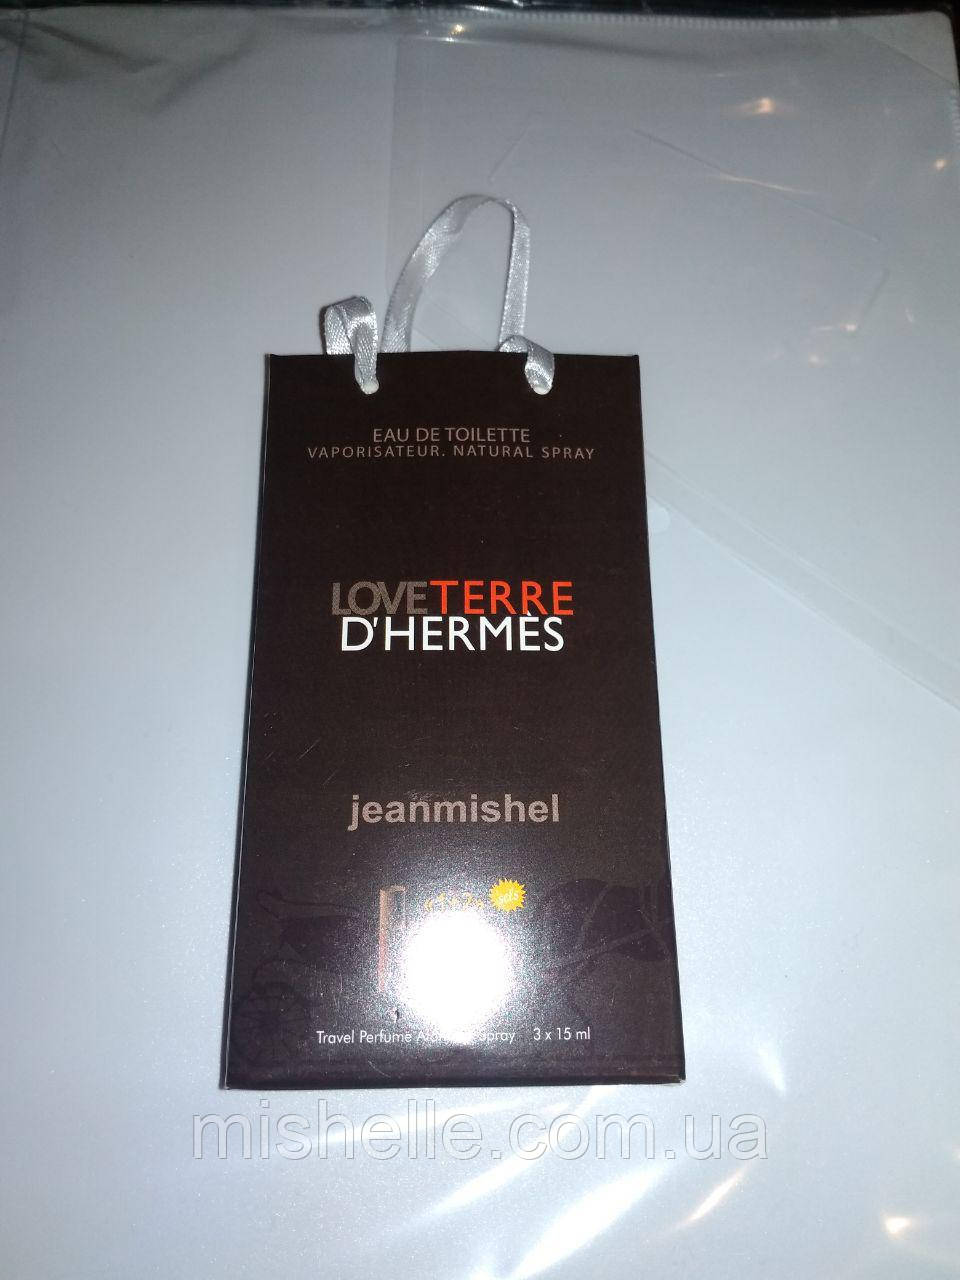 Мини духи в подарочной упаковке jeanmishel Love Terre D`Hermes 45мл